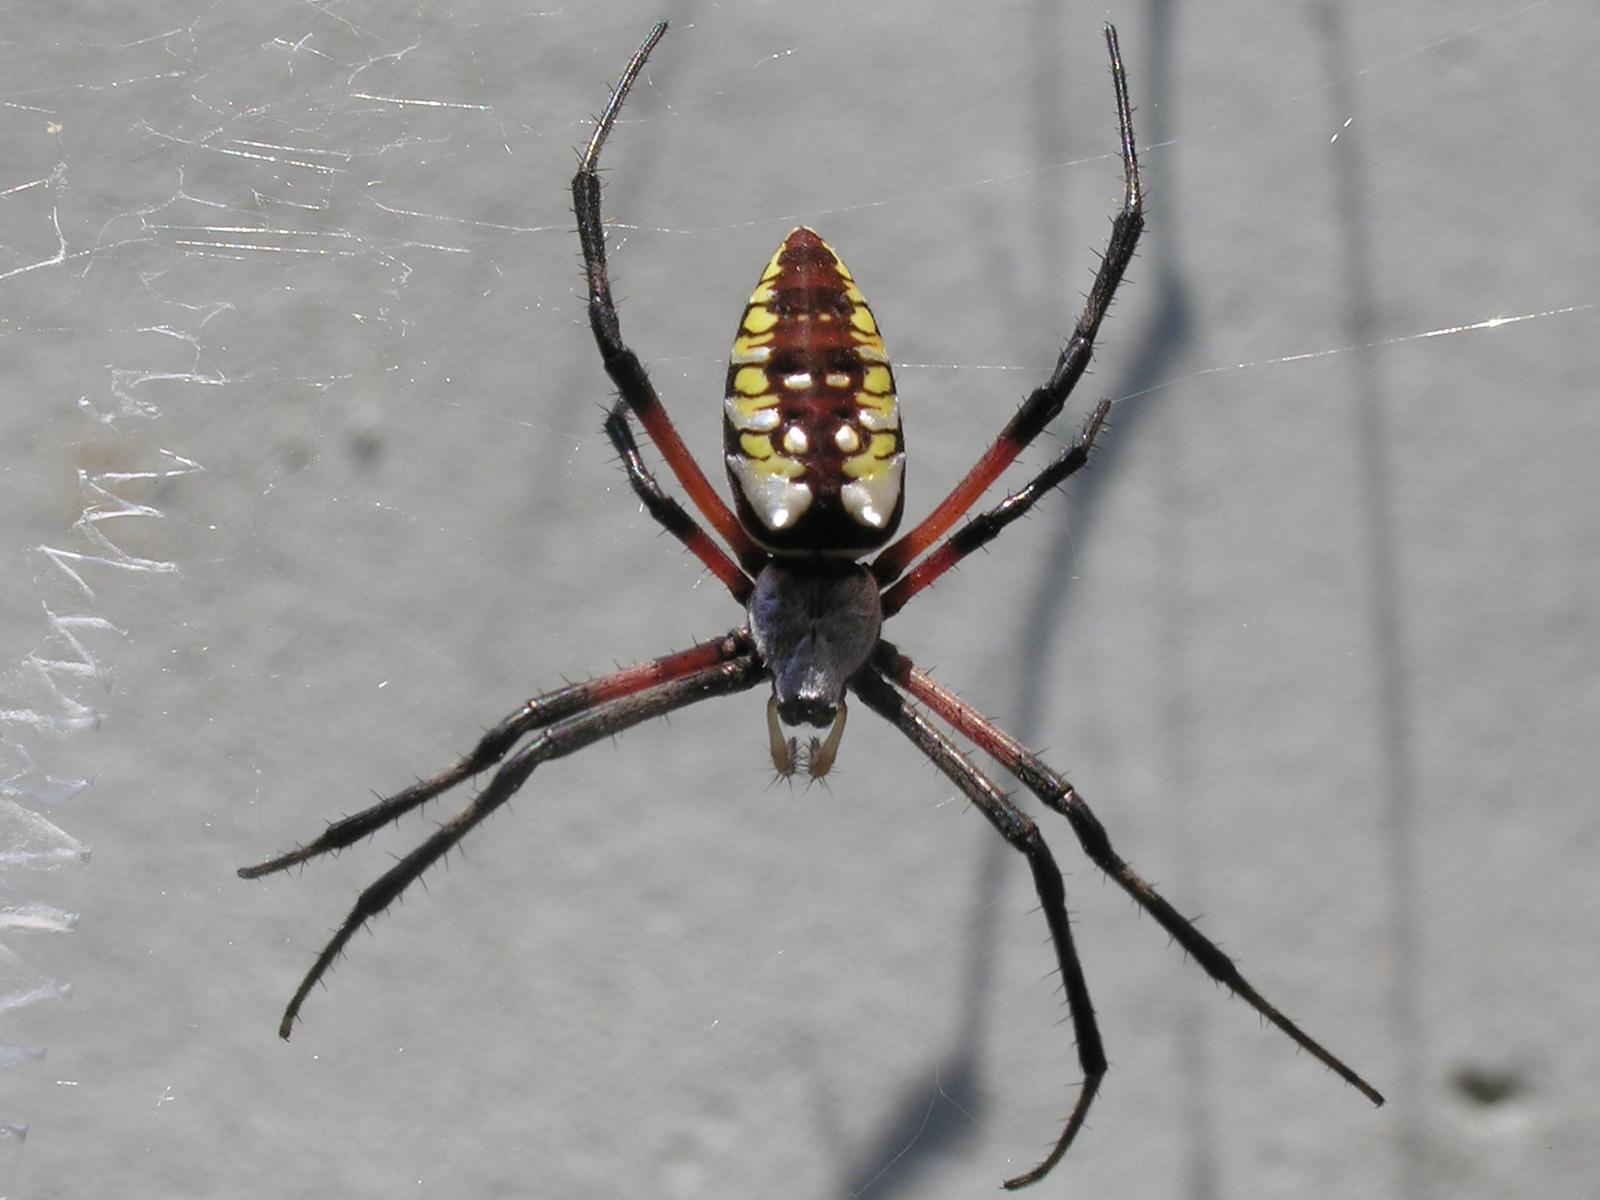 FileYellow garden spider nashvillejpg Wikimedia Commons